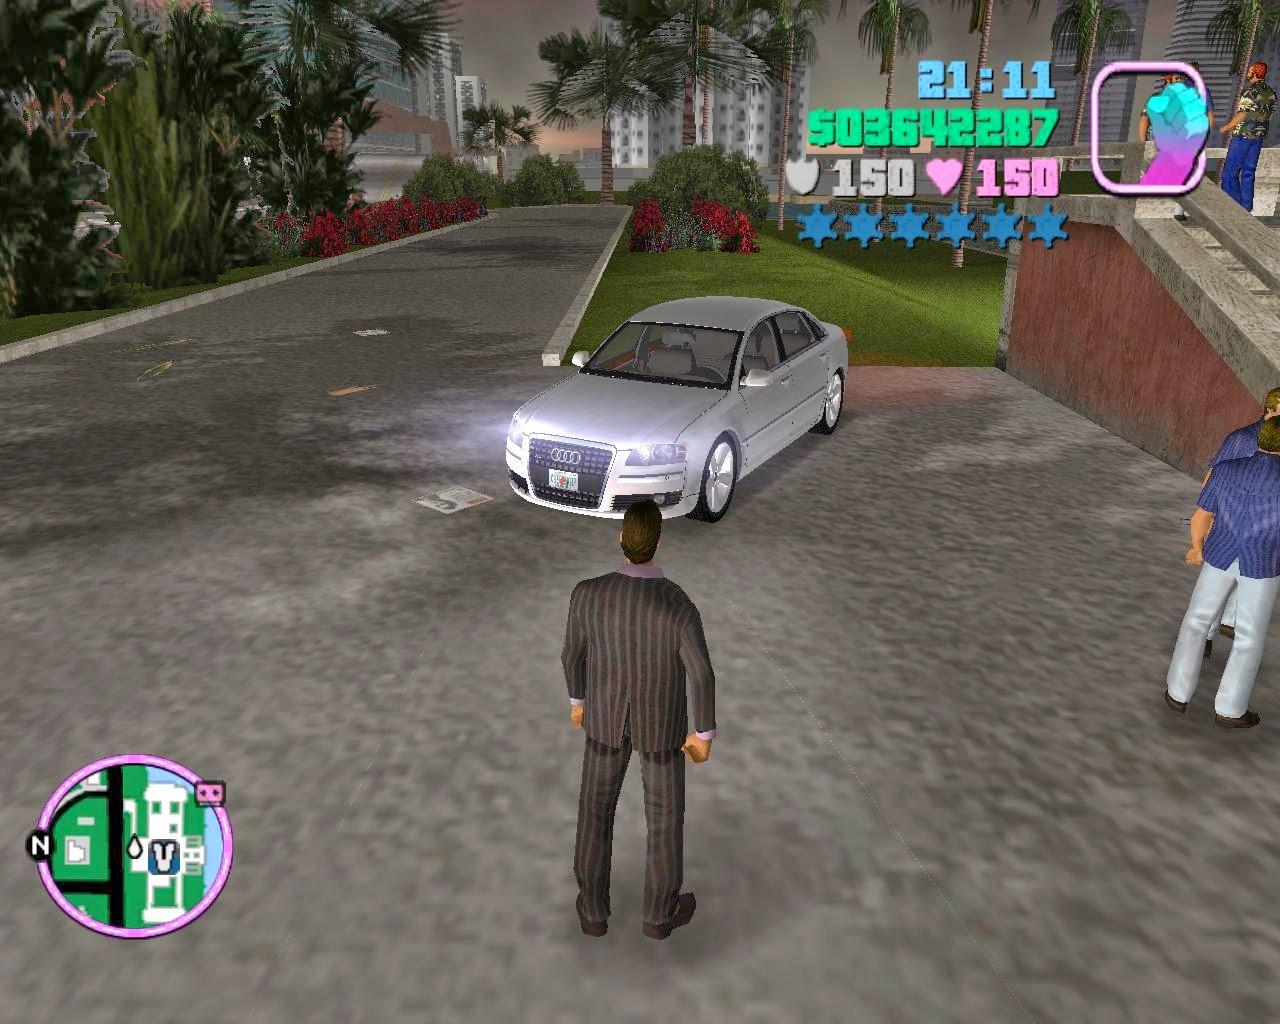 GTA 3 Free Download for PC Full Version Setup Windows 7